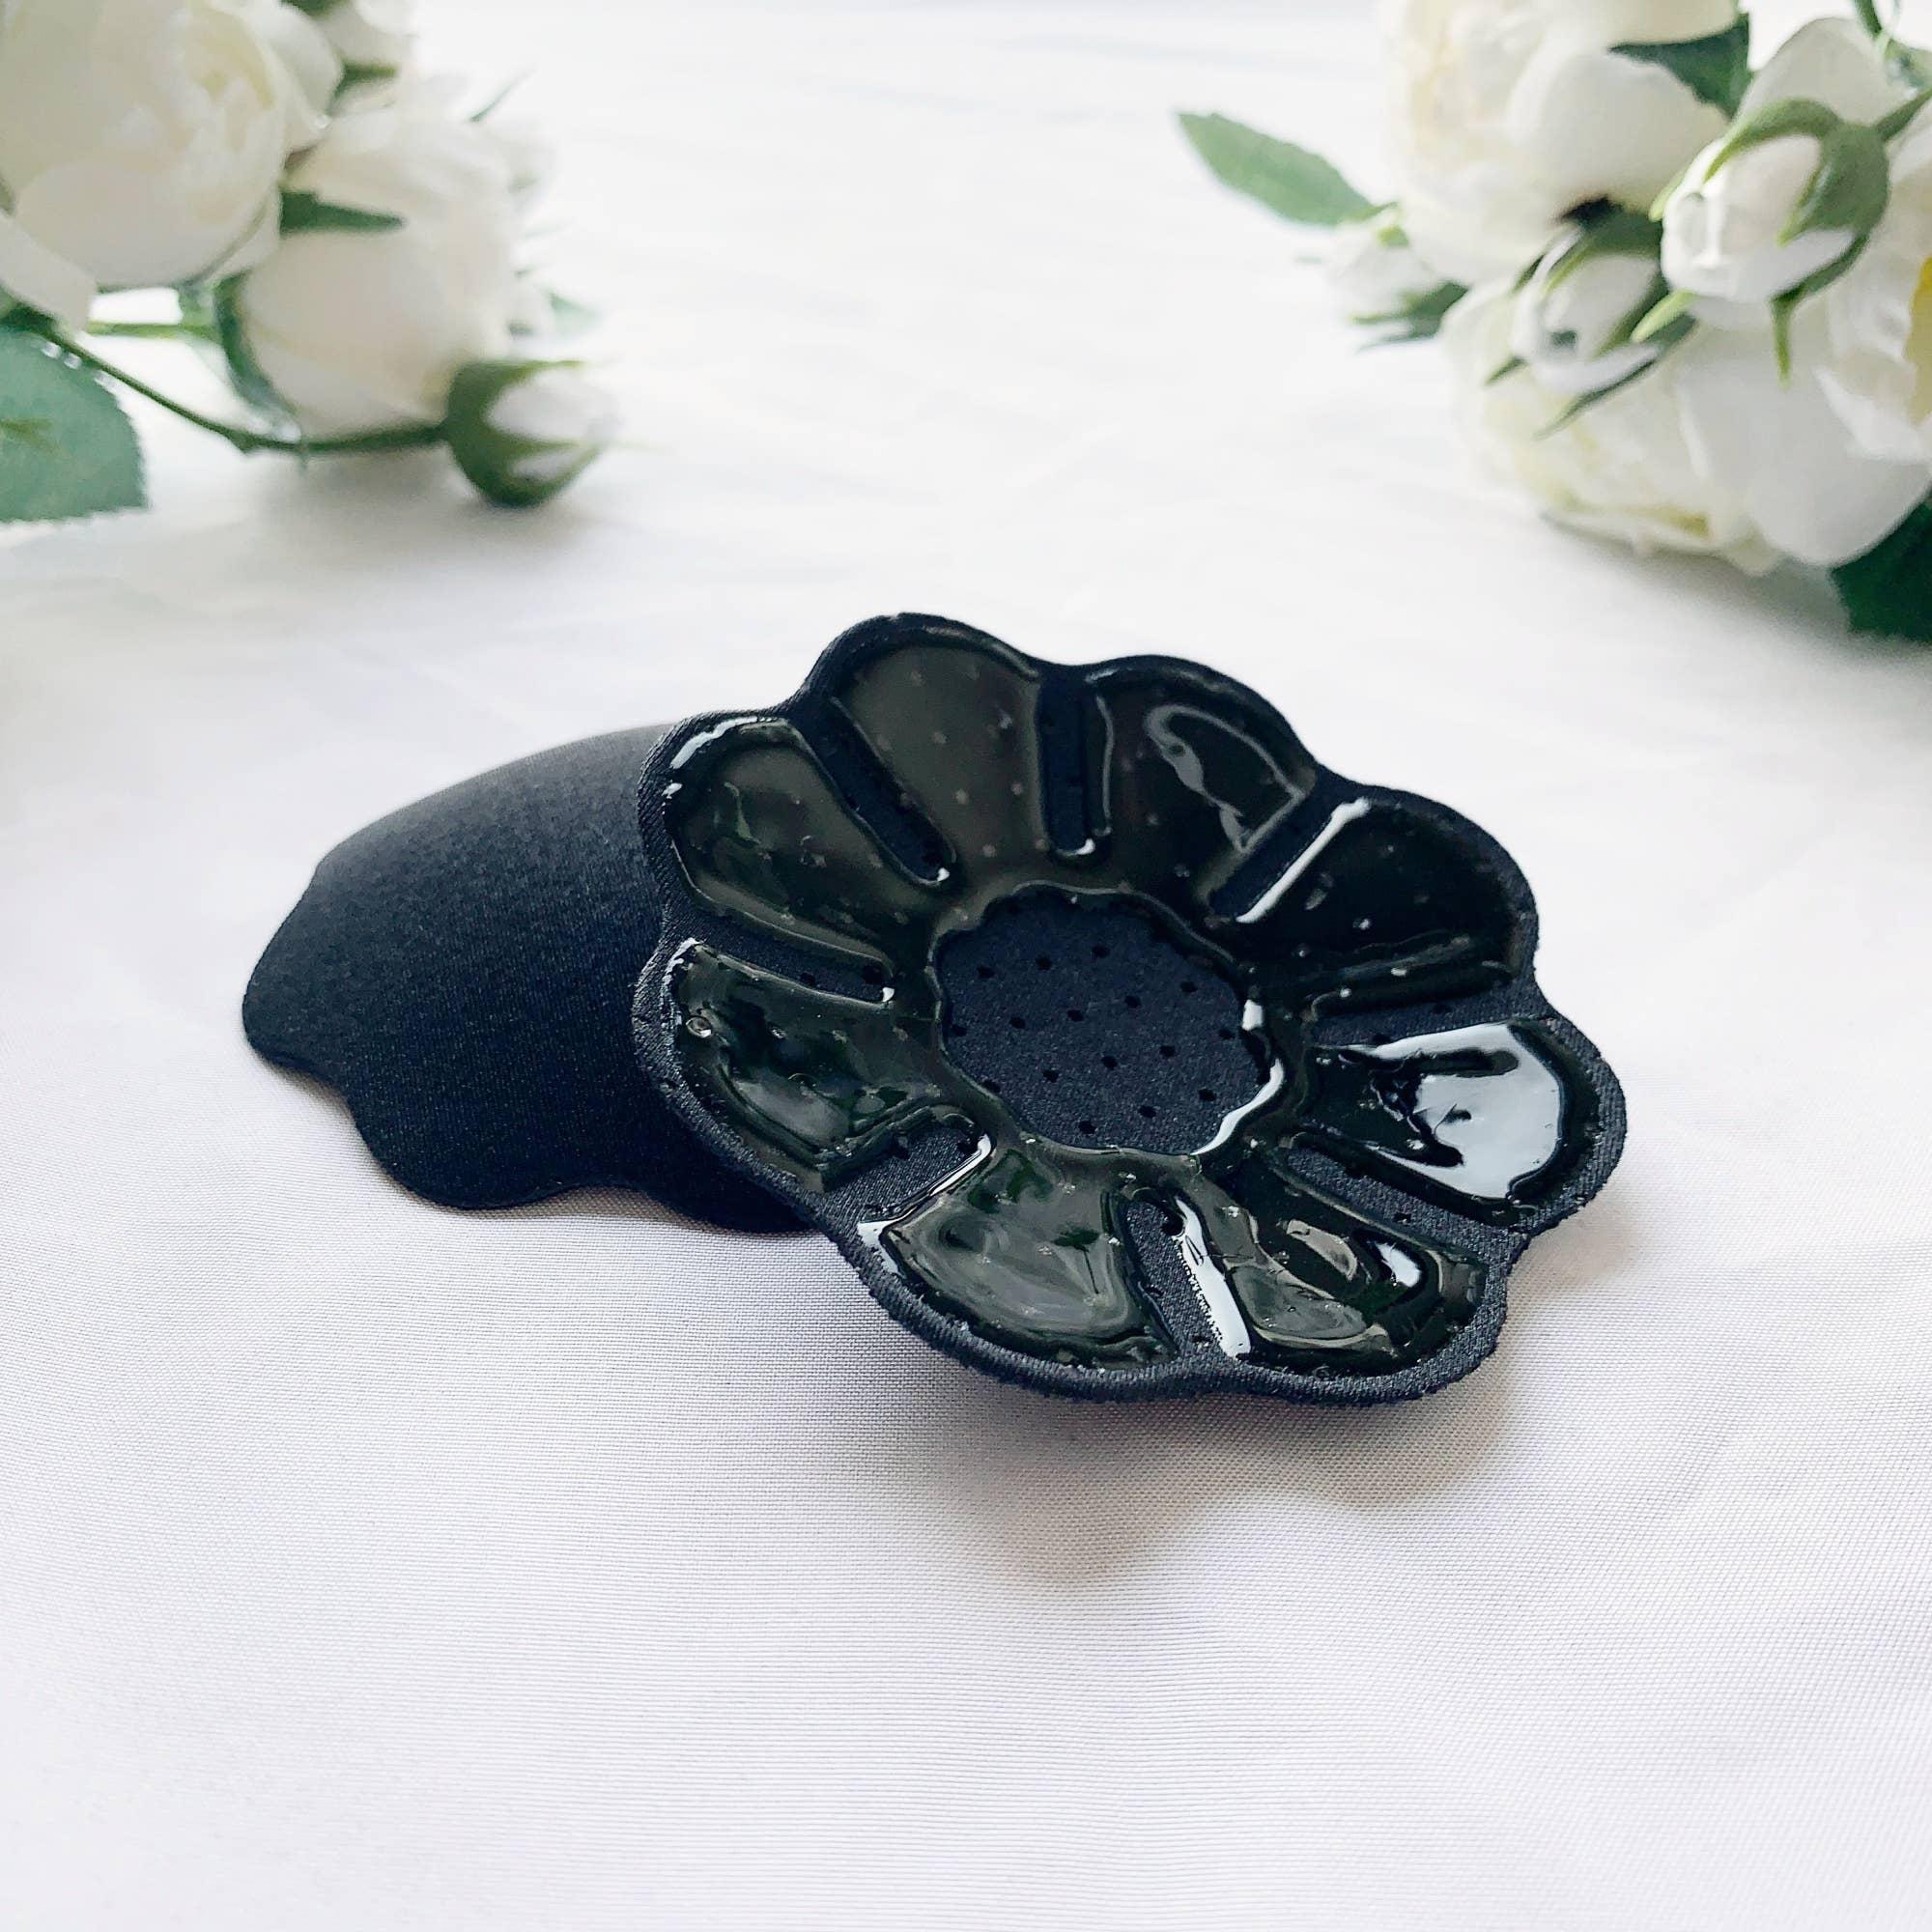 Flower Fabric Nipple Cover - Black | Trada Marketplace